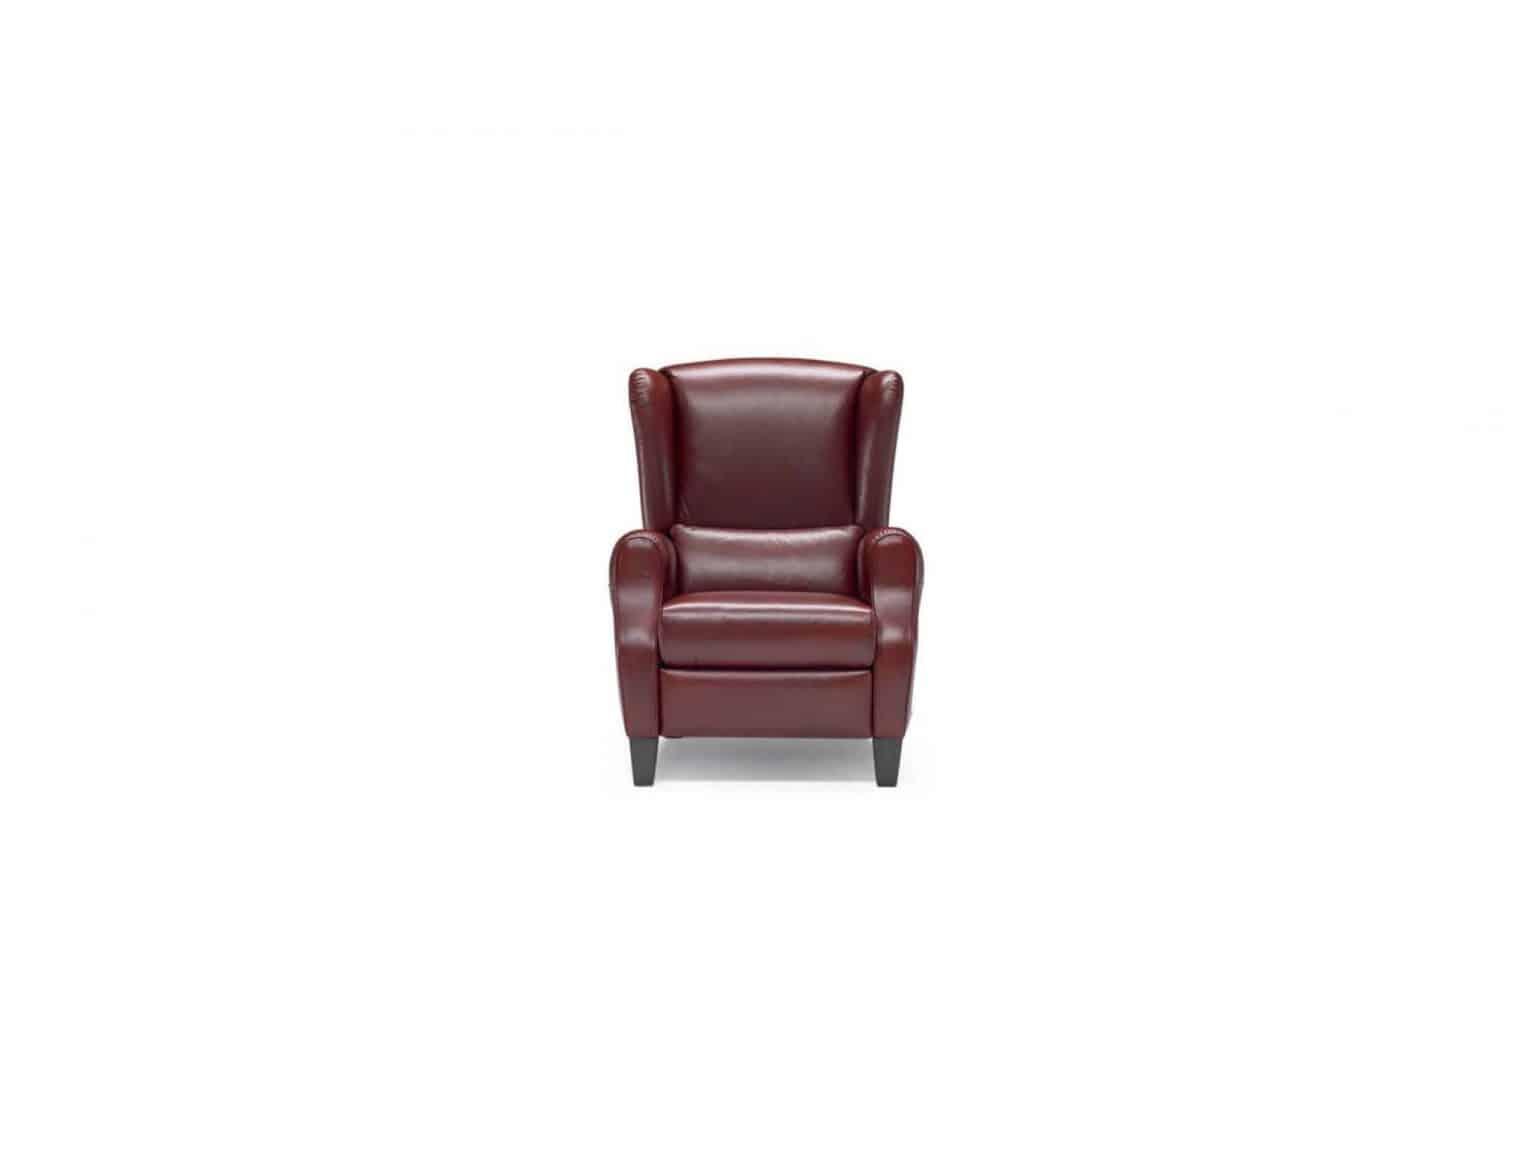 Natuzzi fauteuil Altea pa